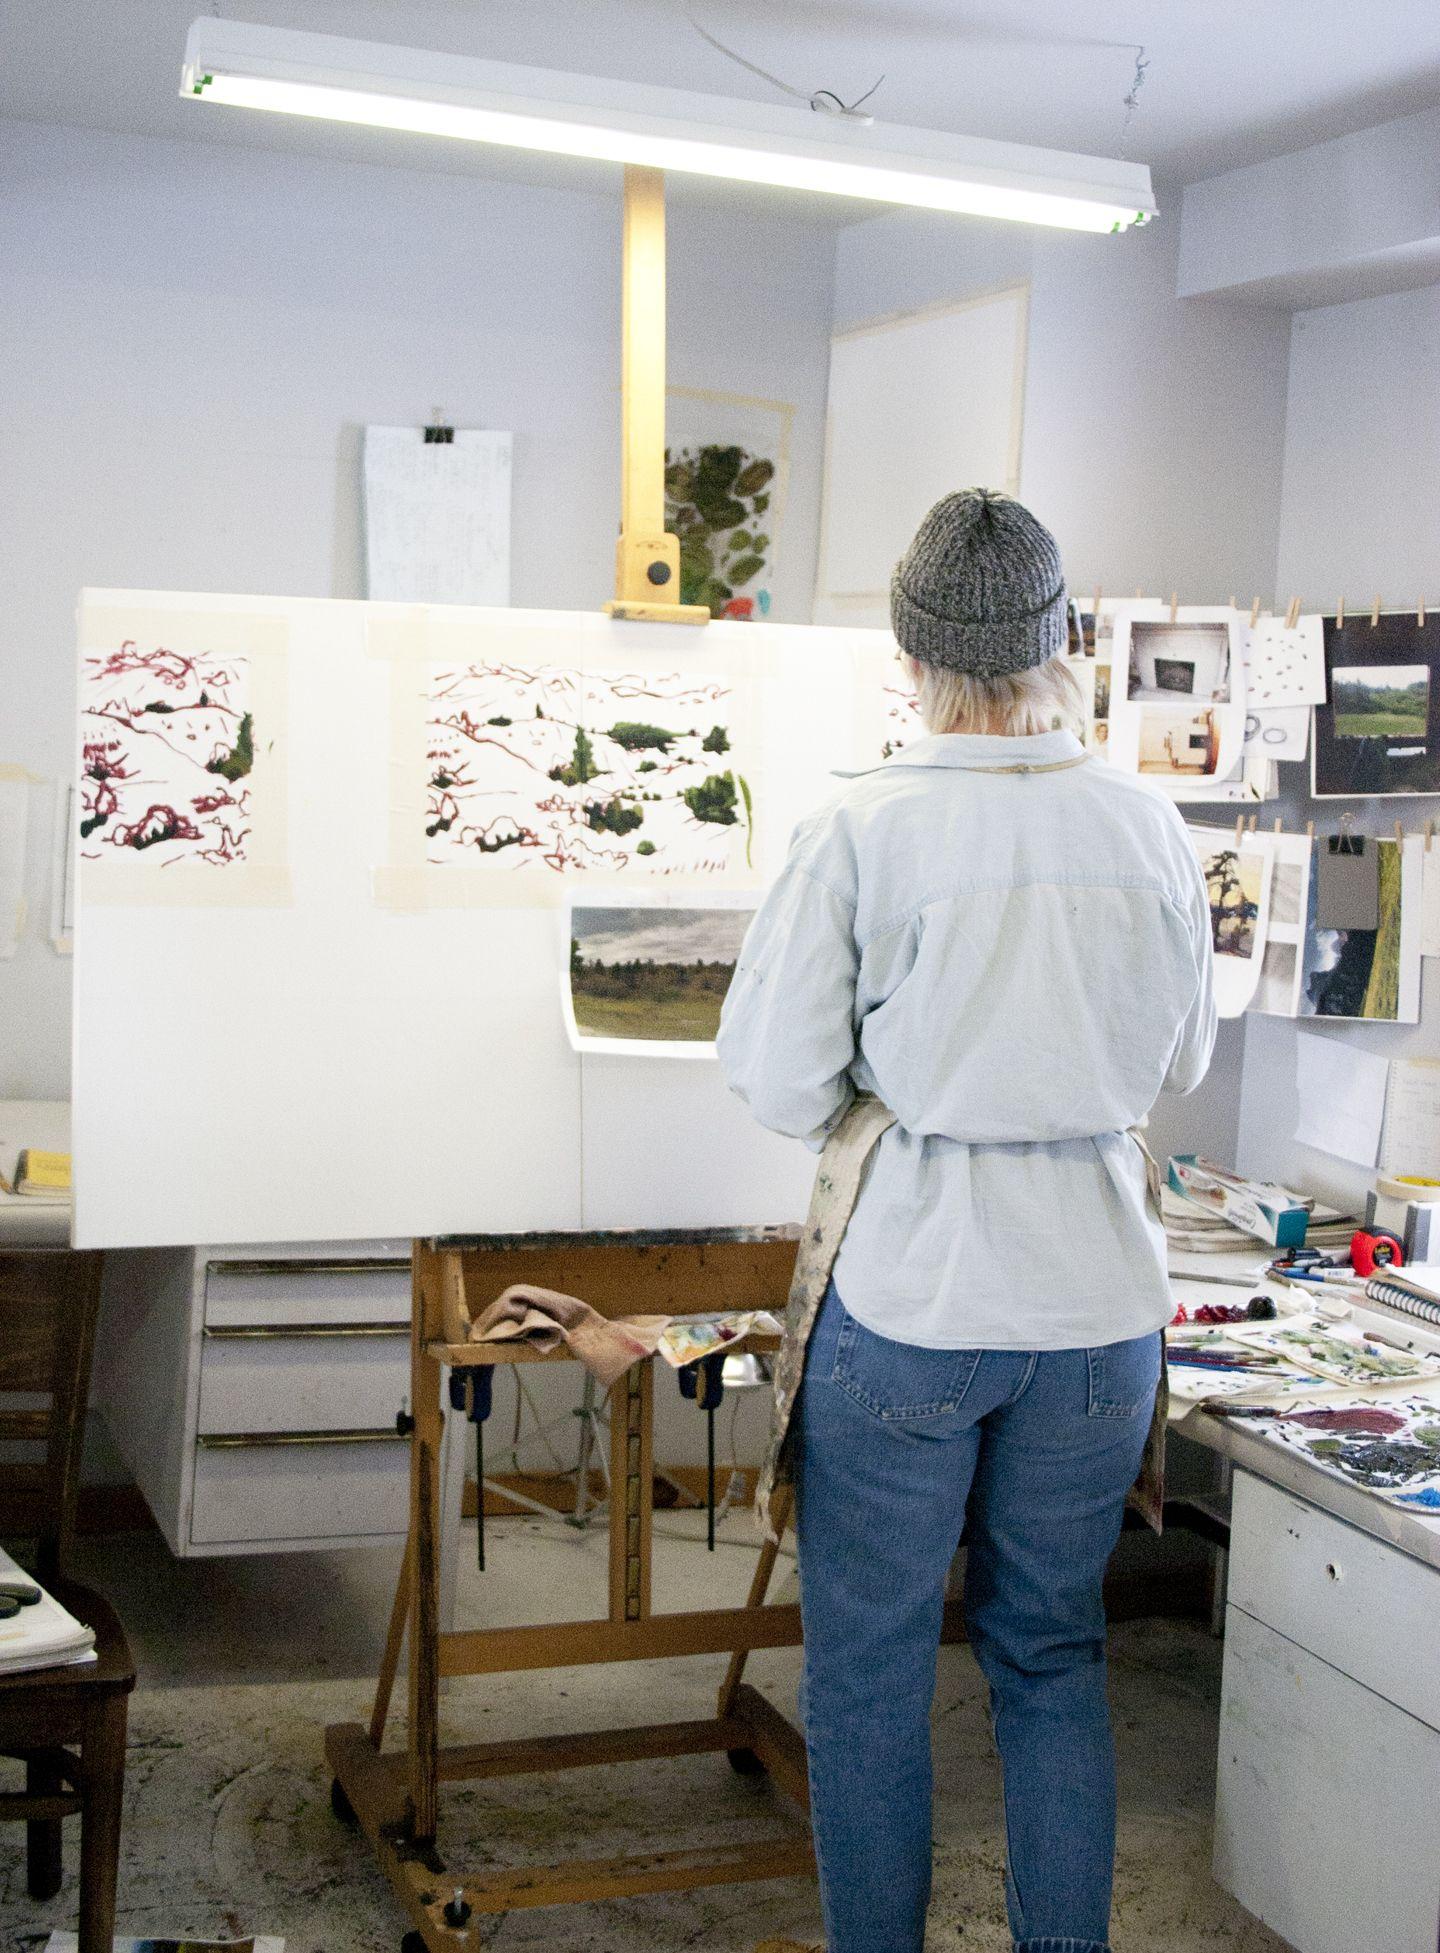 Kristen Sharpe #artist-in-residence #painter #PrinceEdwardCounty #sparkboxstudio